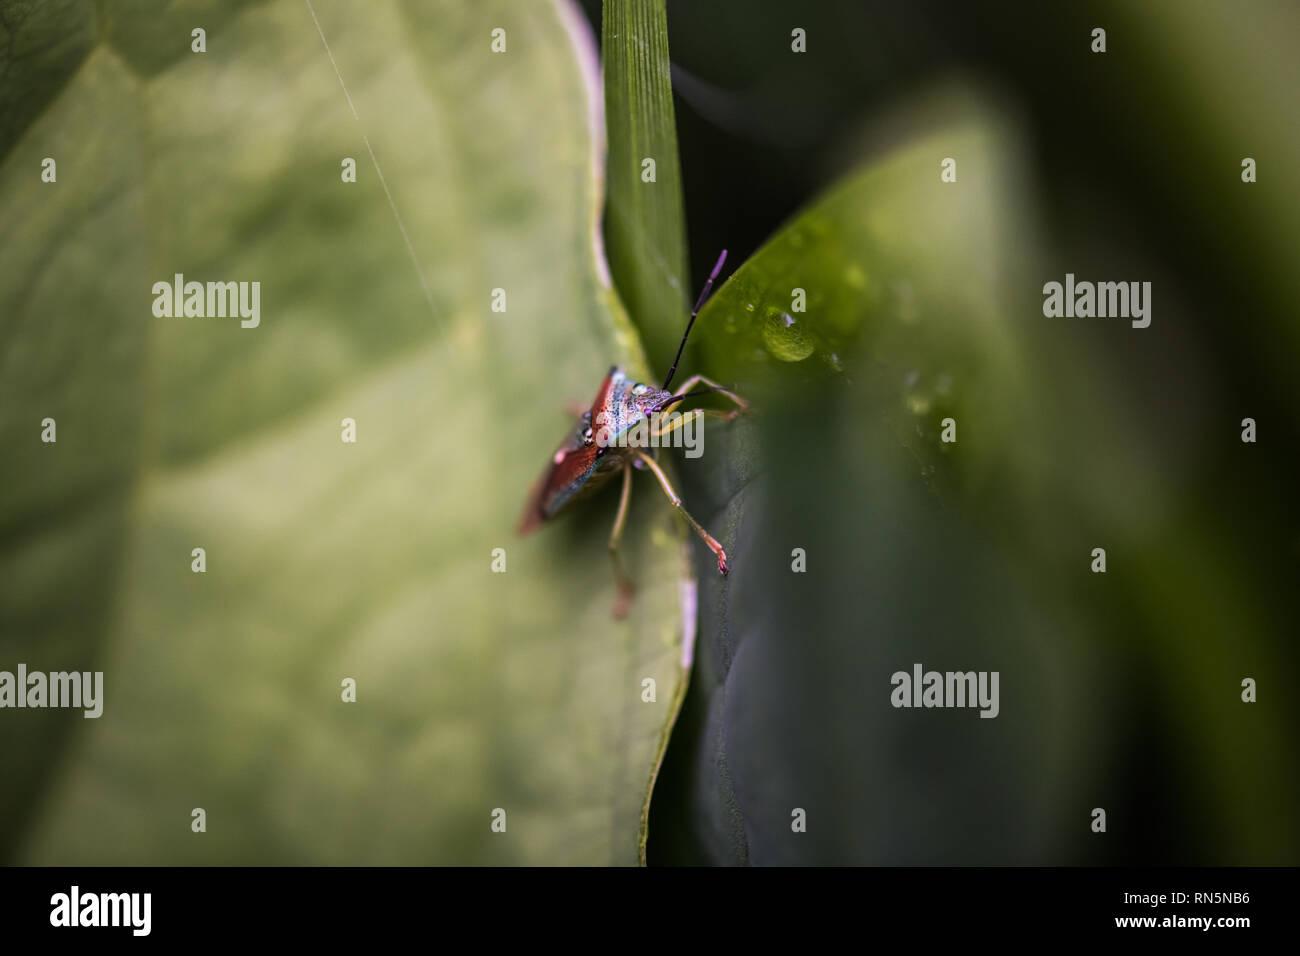 Bunte stinken bug? auf einem grünen Blatt. Tsugaike, Hakuba, Nagano, Japan Stockbild